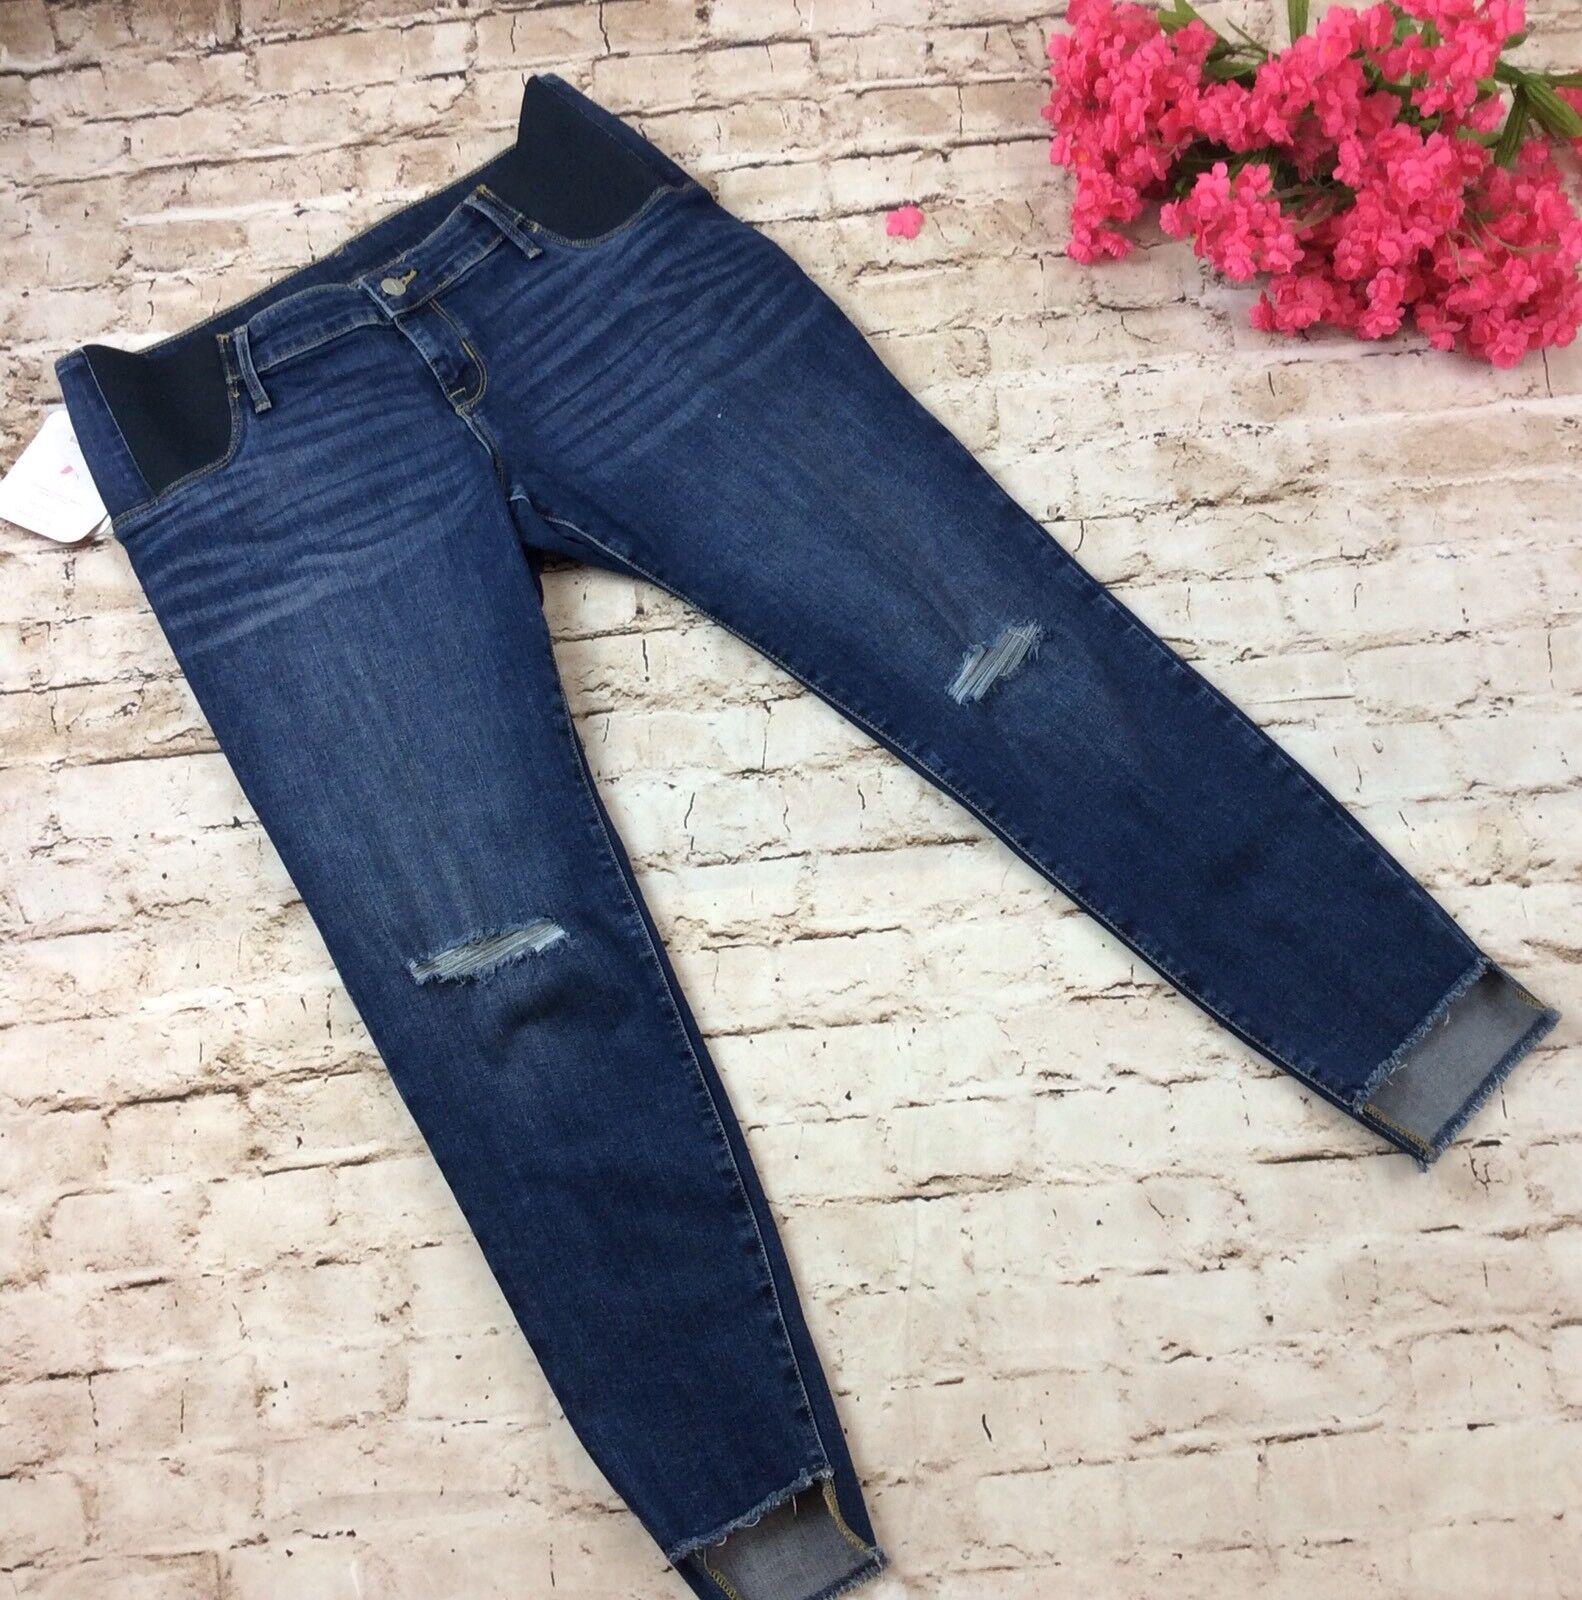 Isabel Maternity Jeans 18 Skinny Cut Distressed Side Panel Frayed Hem Stretch For Sale Online